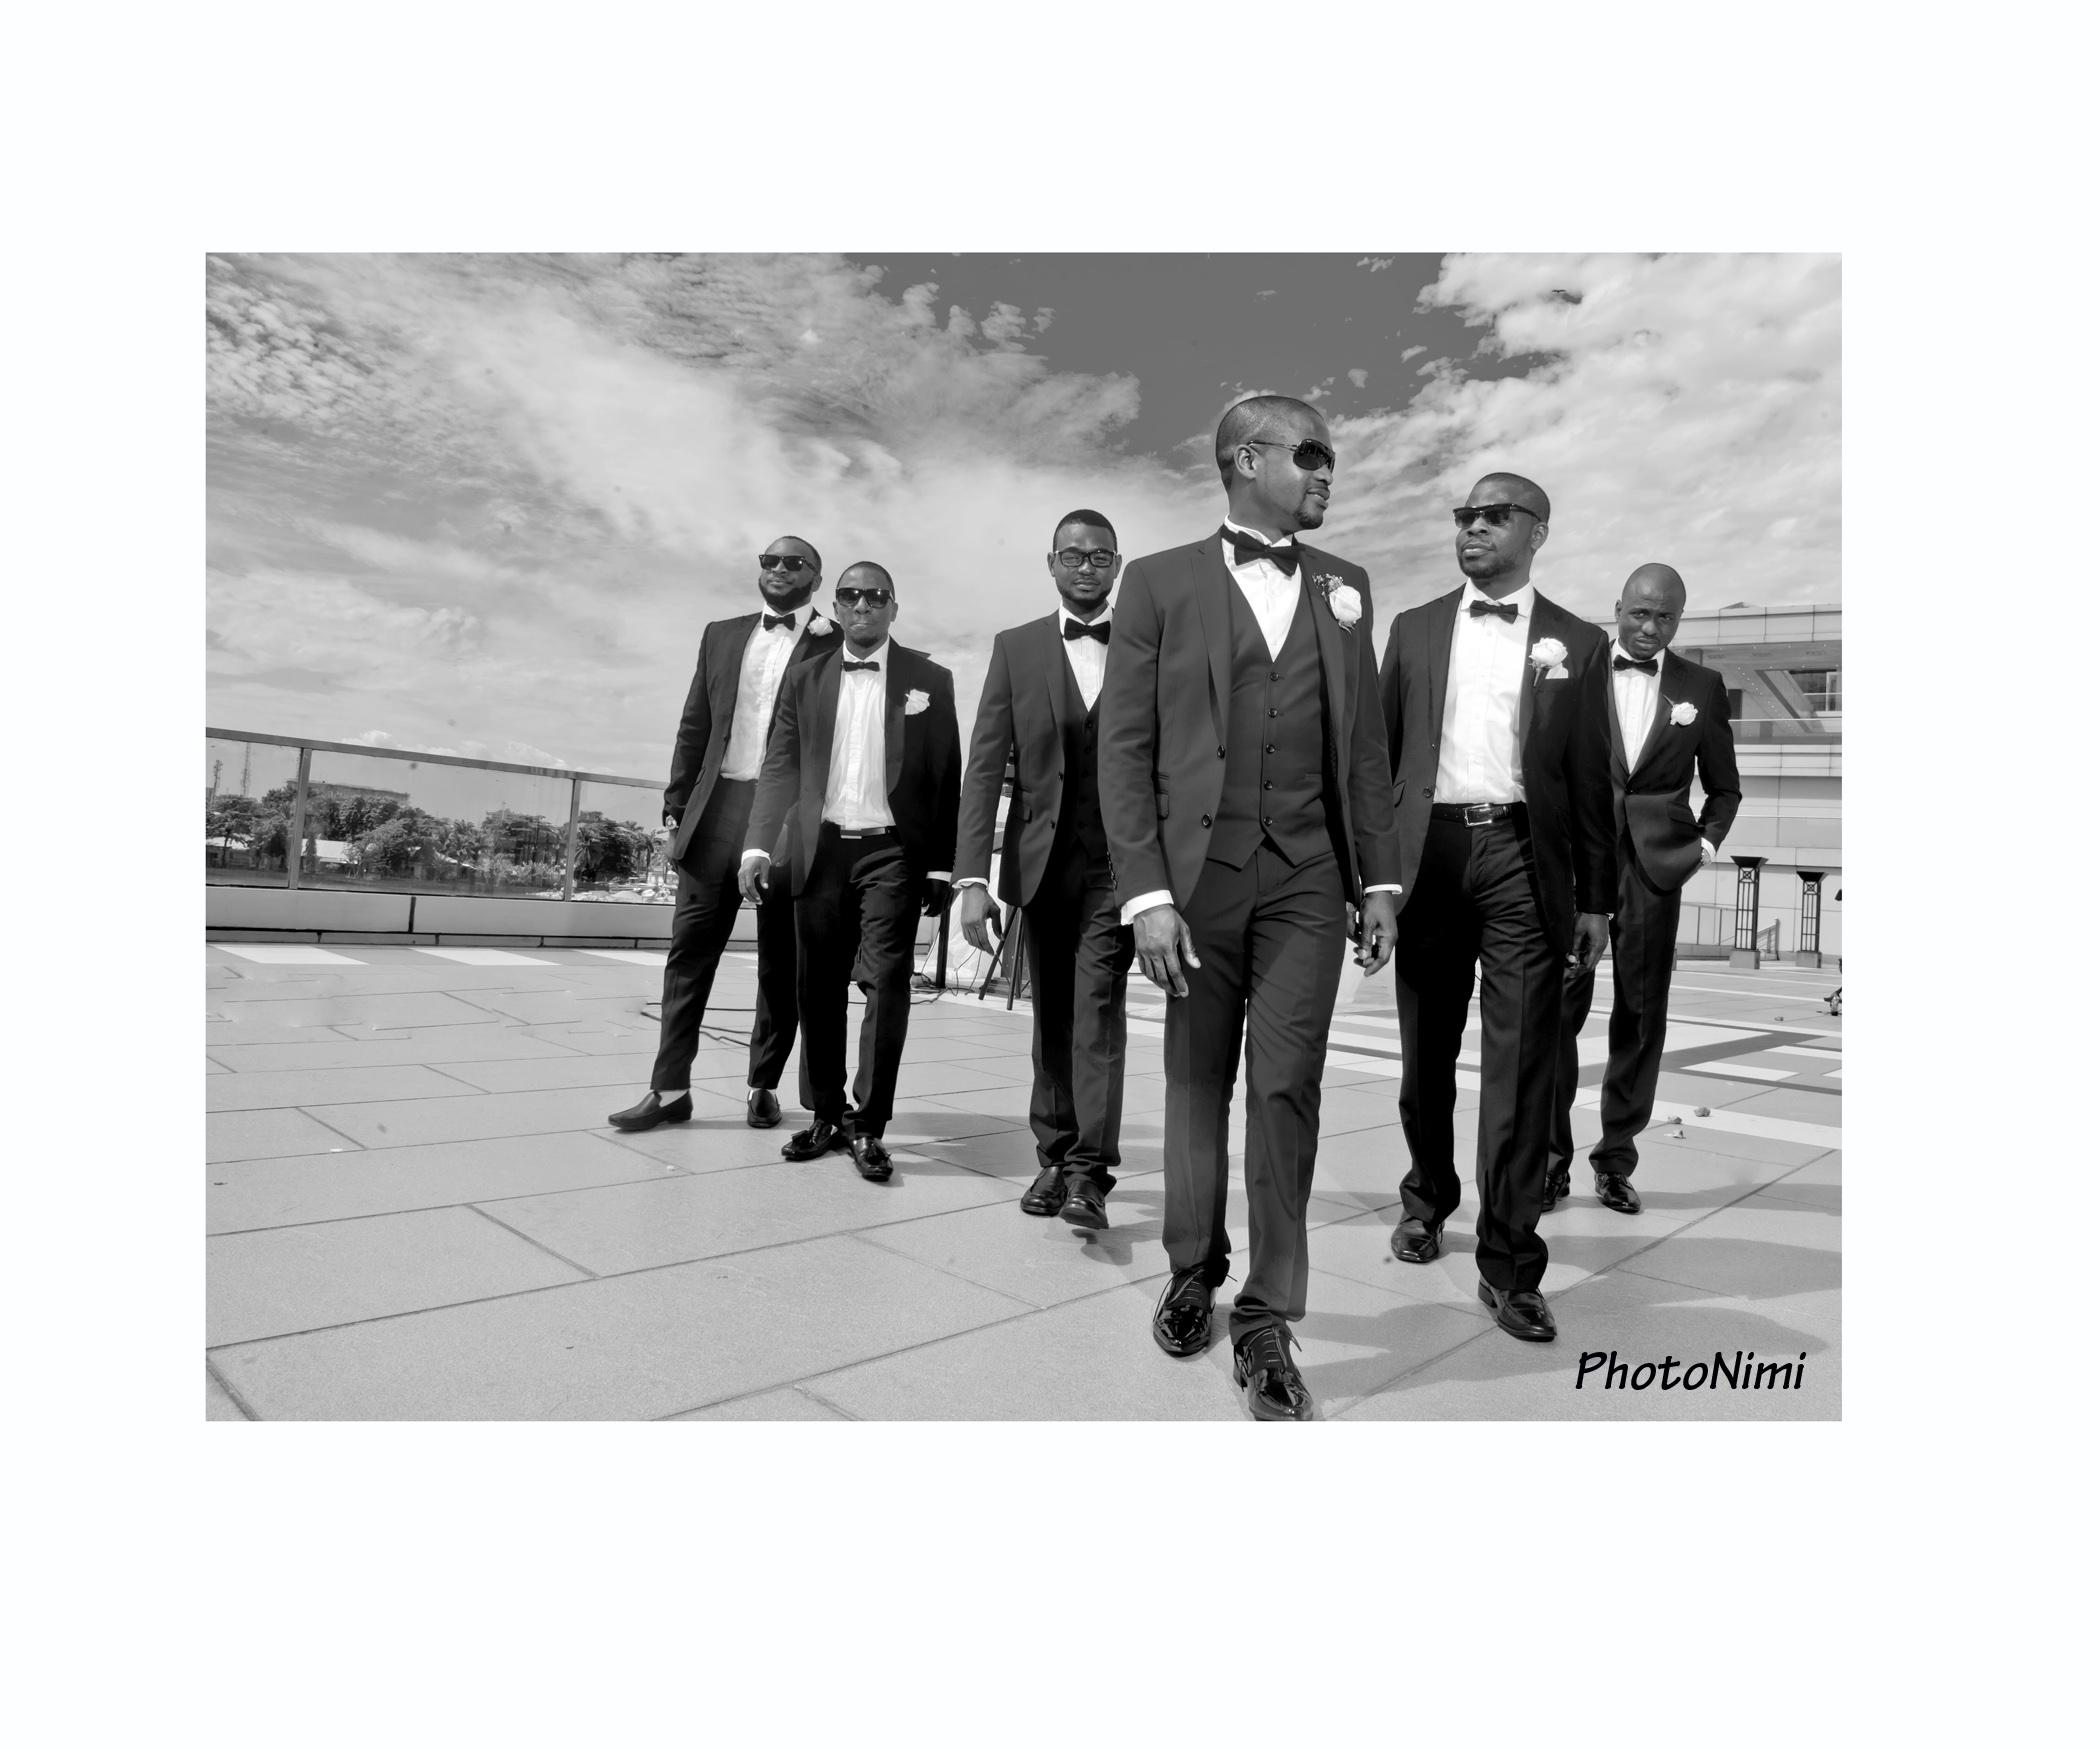 bridegroom and groomsmen